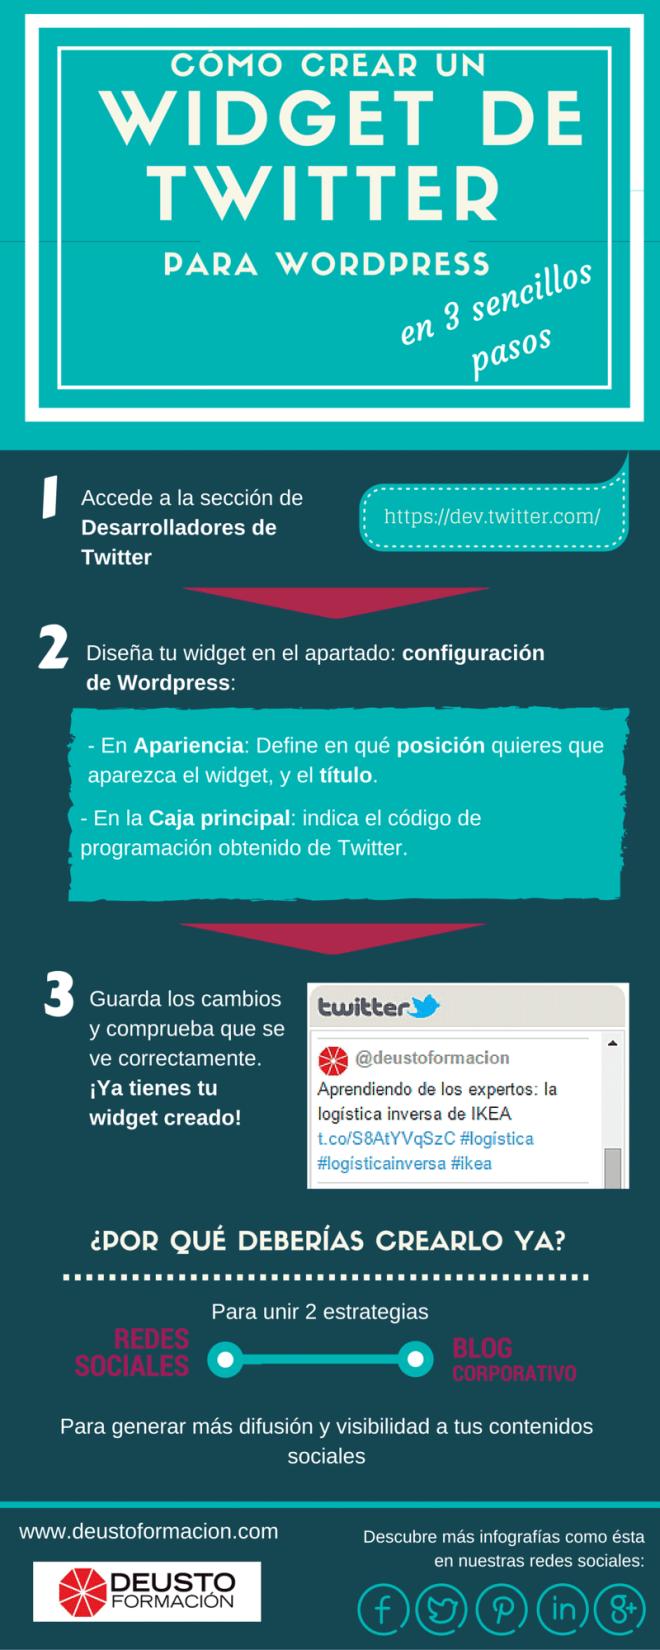 3 pasos para crear un widget de Twitter en WordPress